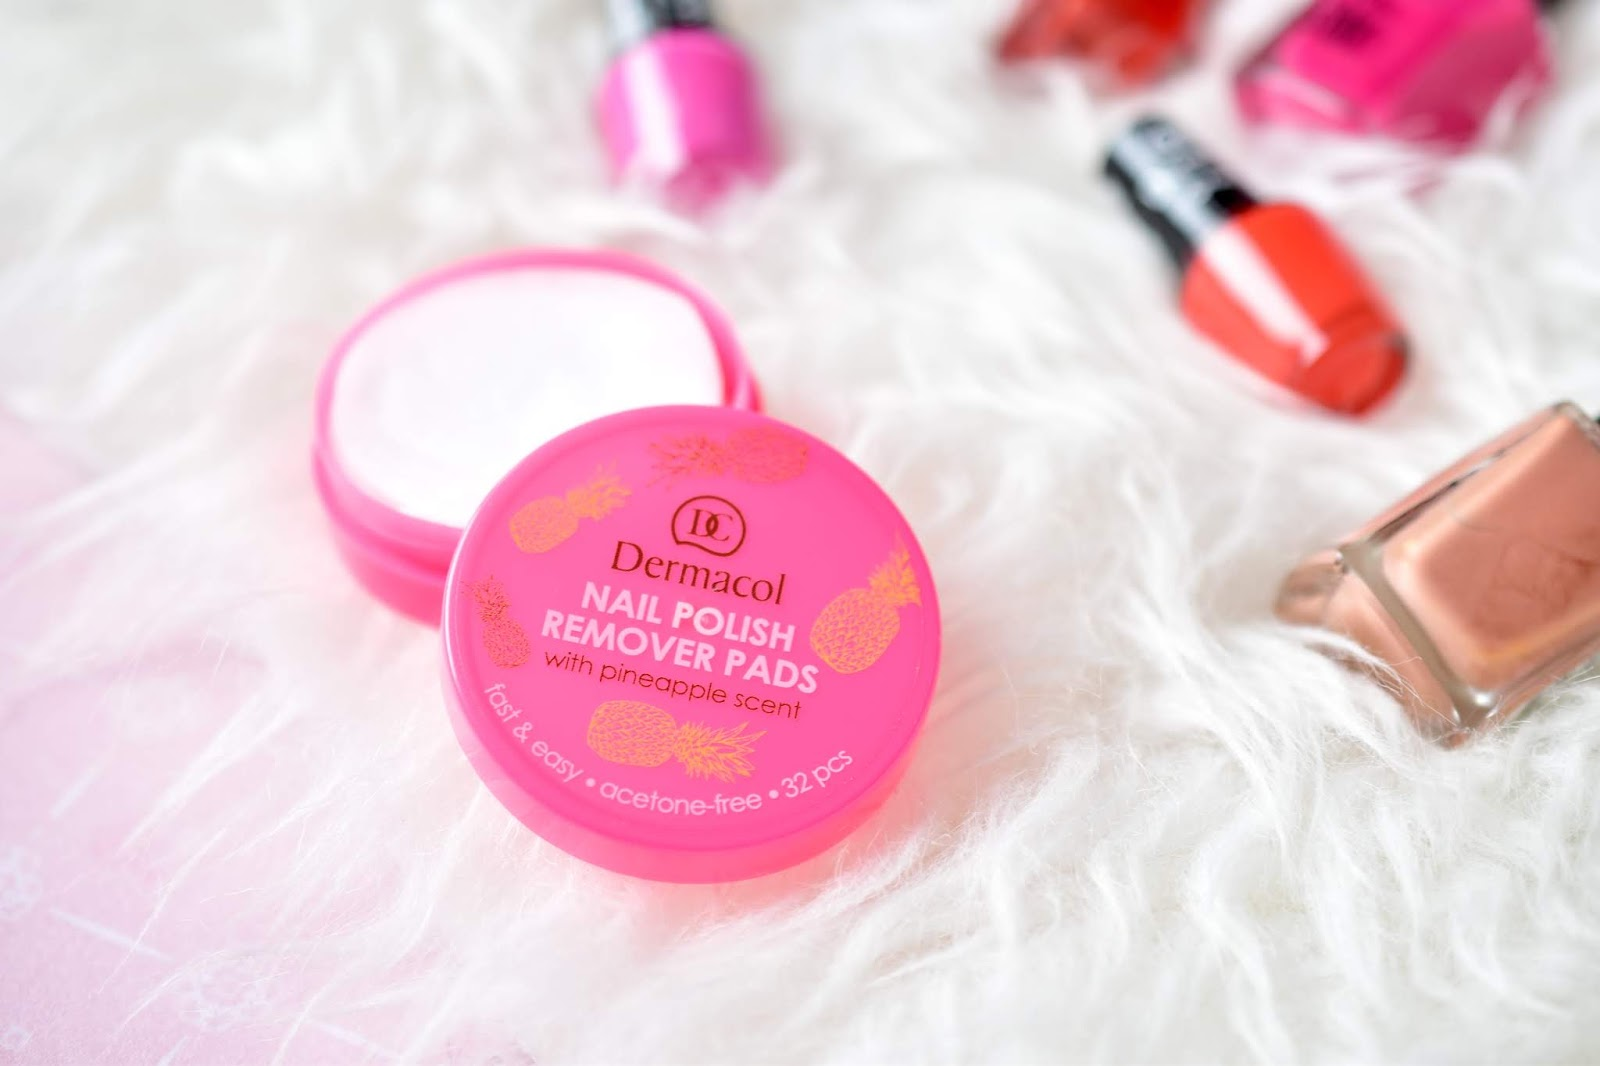 dermacol nail polish remover pads